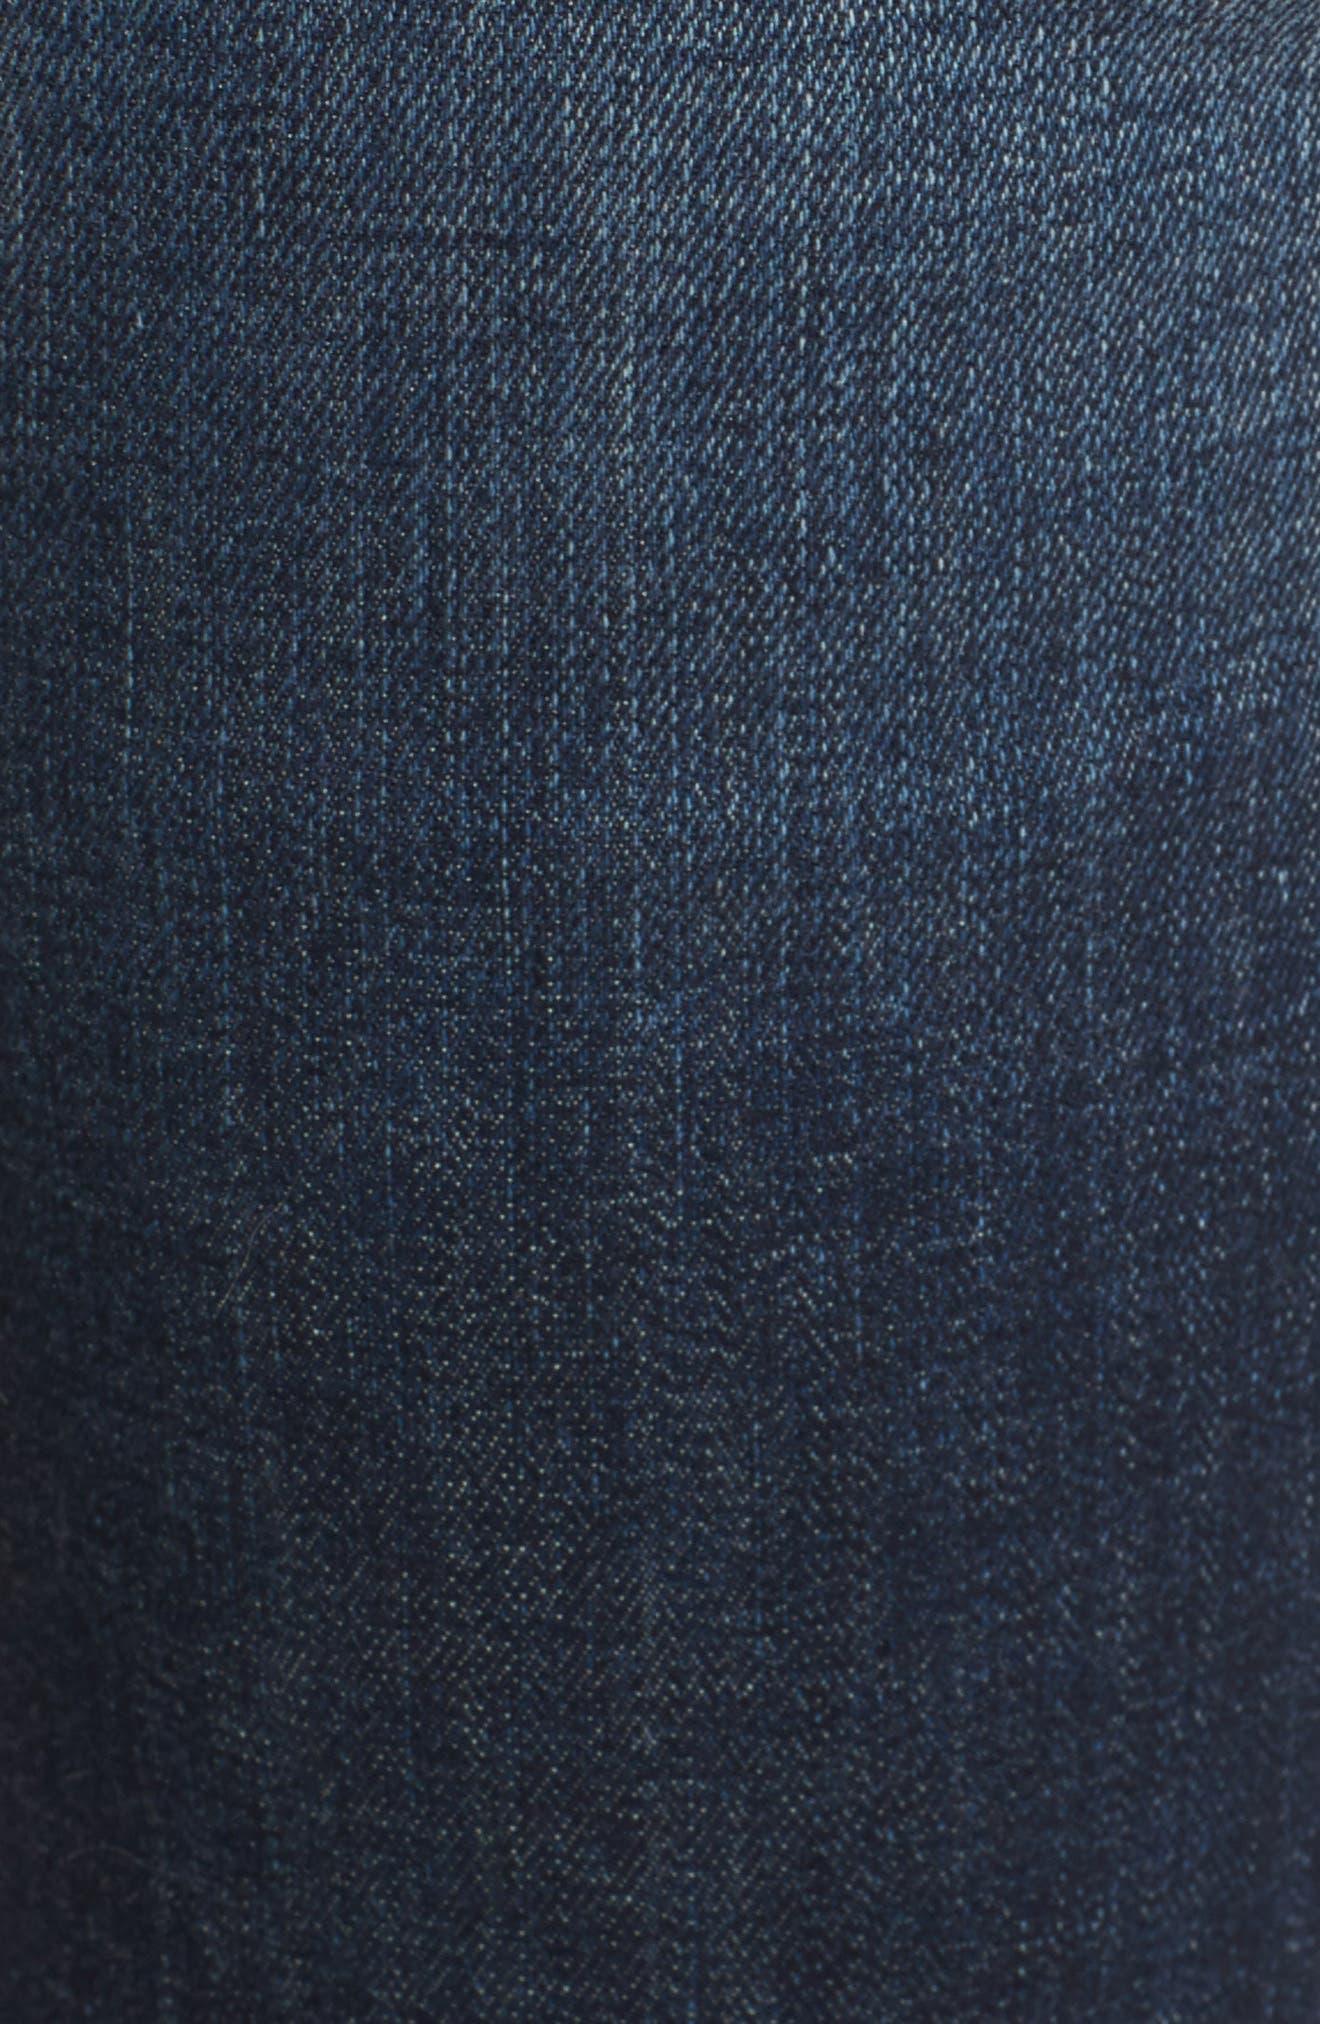 Newton High Waist Skinny Jeans,                             Alternate thumbnail 5, color,                             420